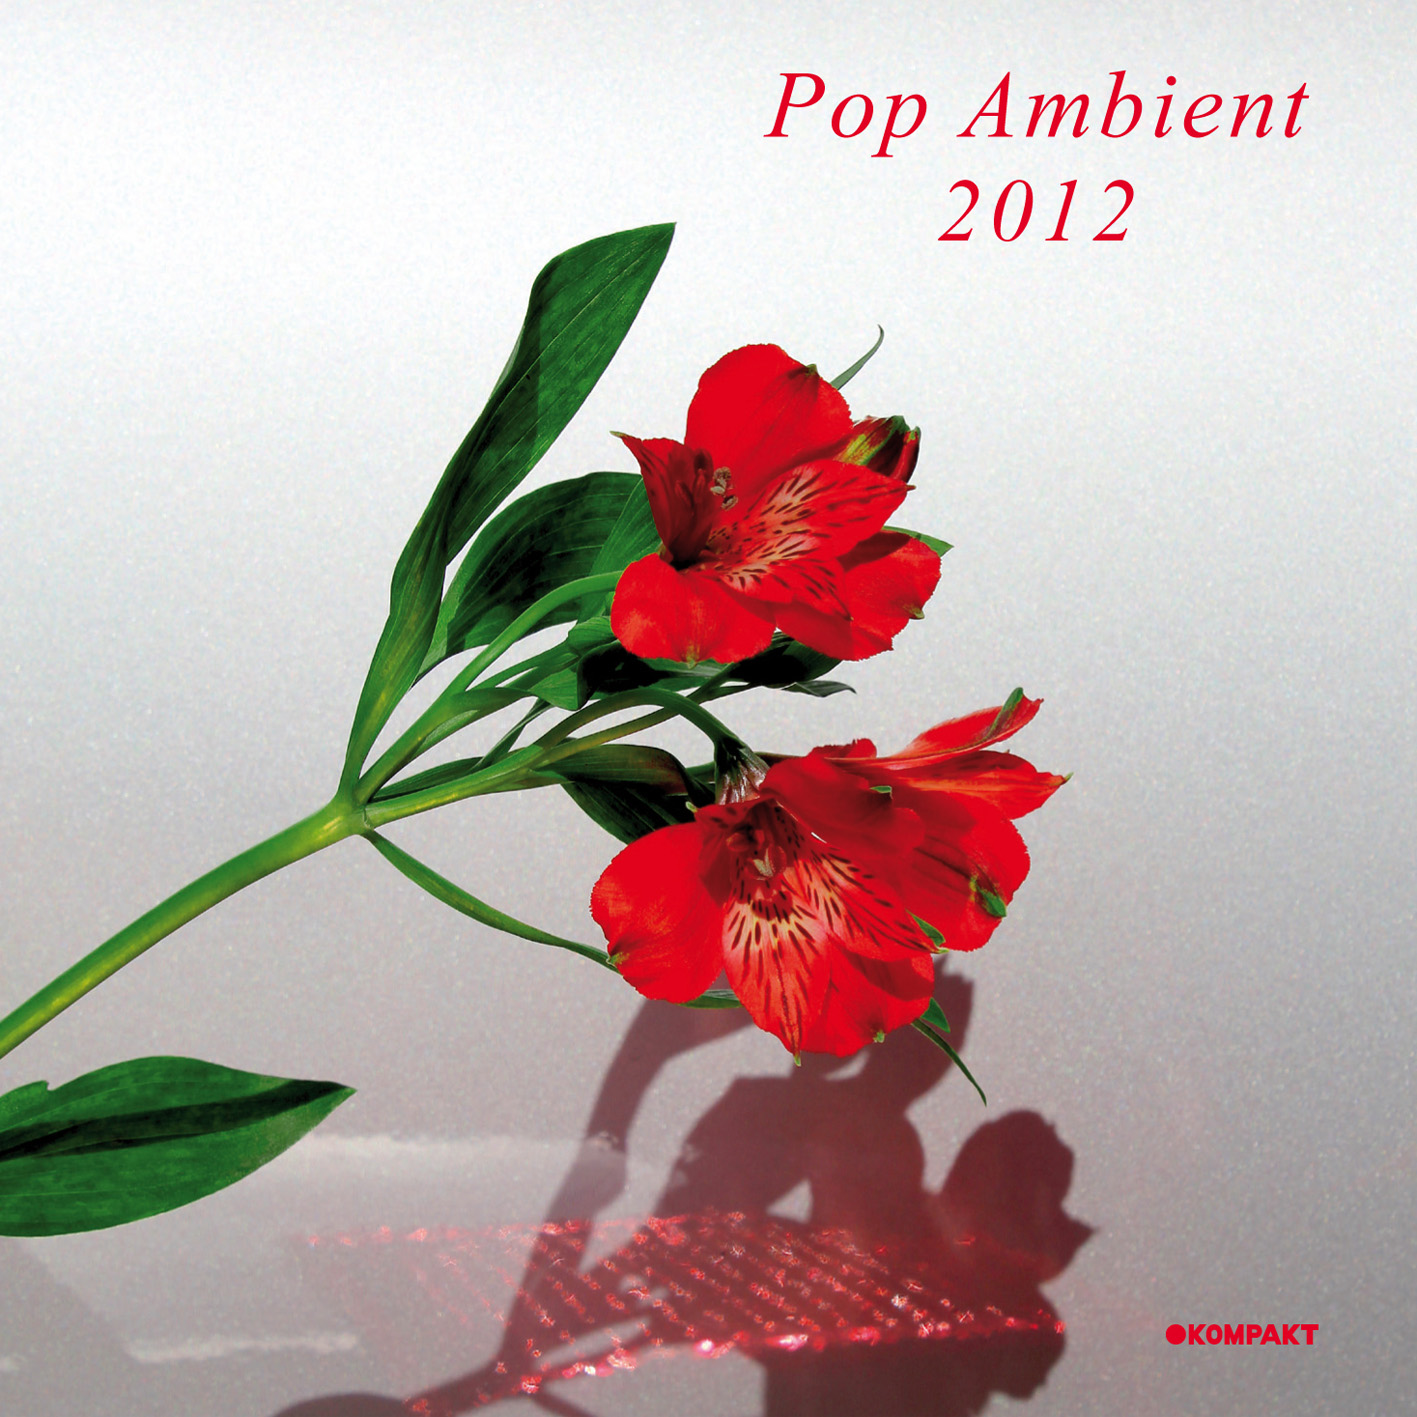 V/A – Pop Ambient 2012 (KOMPAKT)